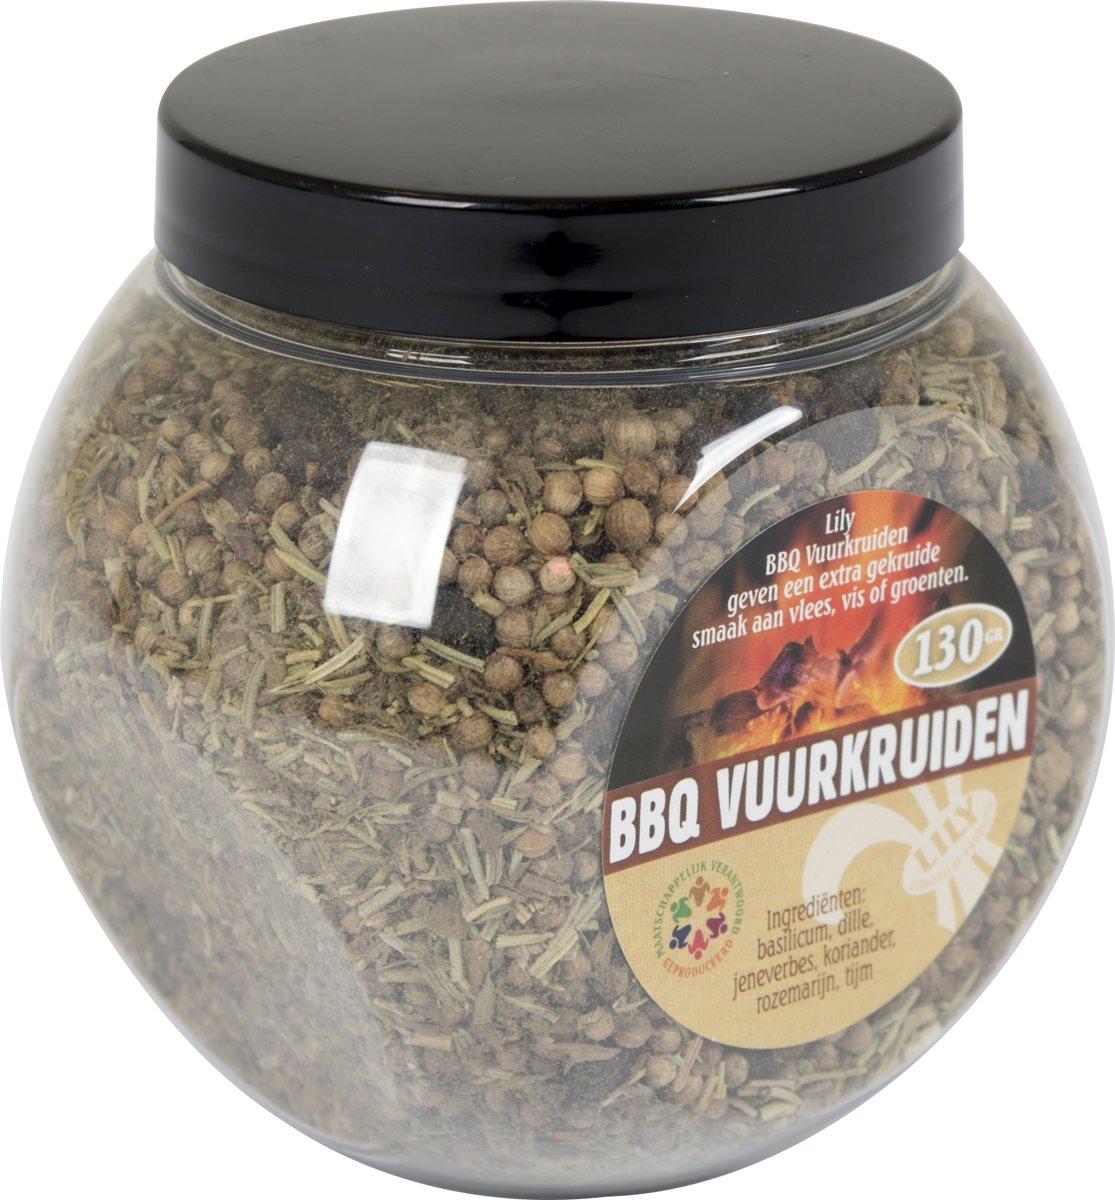 Lily Barbecue Vuurkruiden - 130 Gram kopen